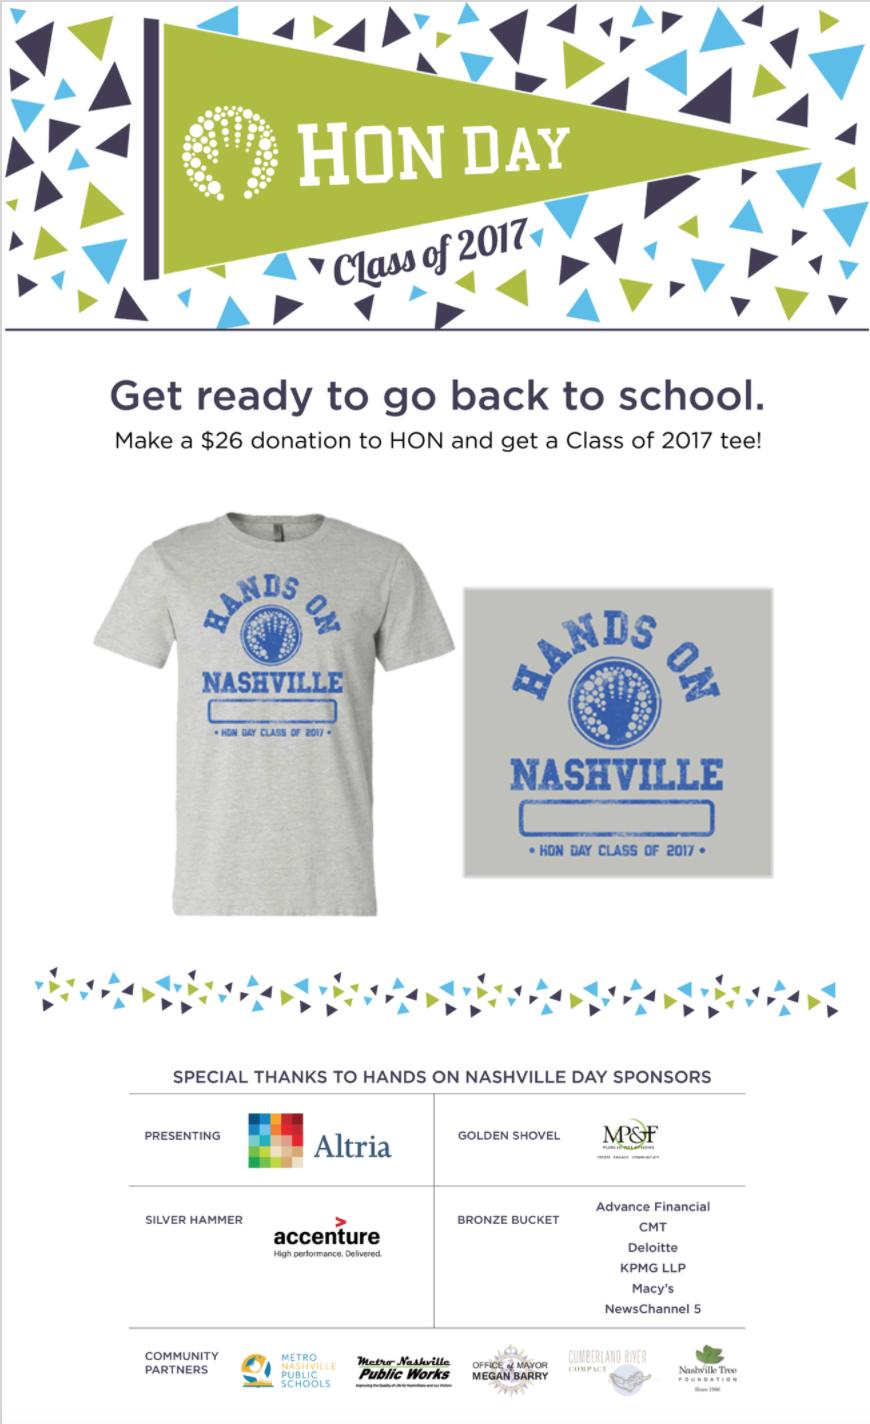 Newsletter: T-shirt promotion